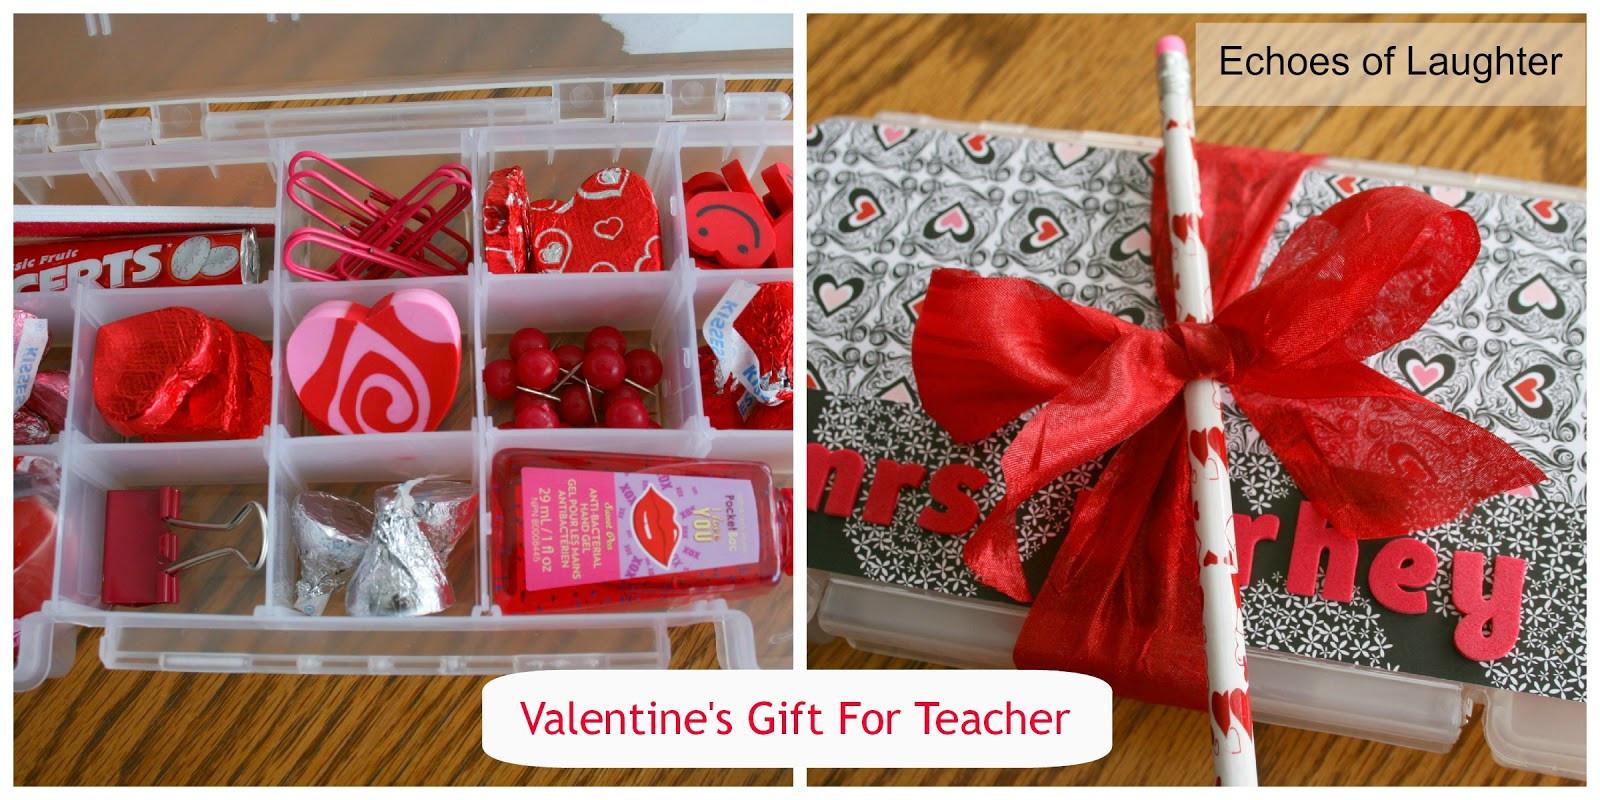 Teacher Valentines Gift Ideas  10 Inspiring Valentine s Ideas Echoes of Laughter